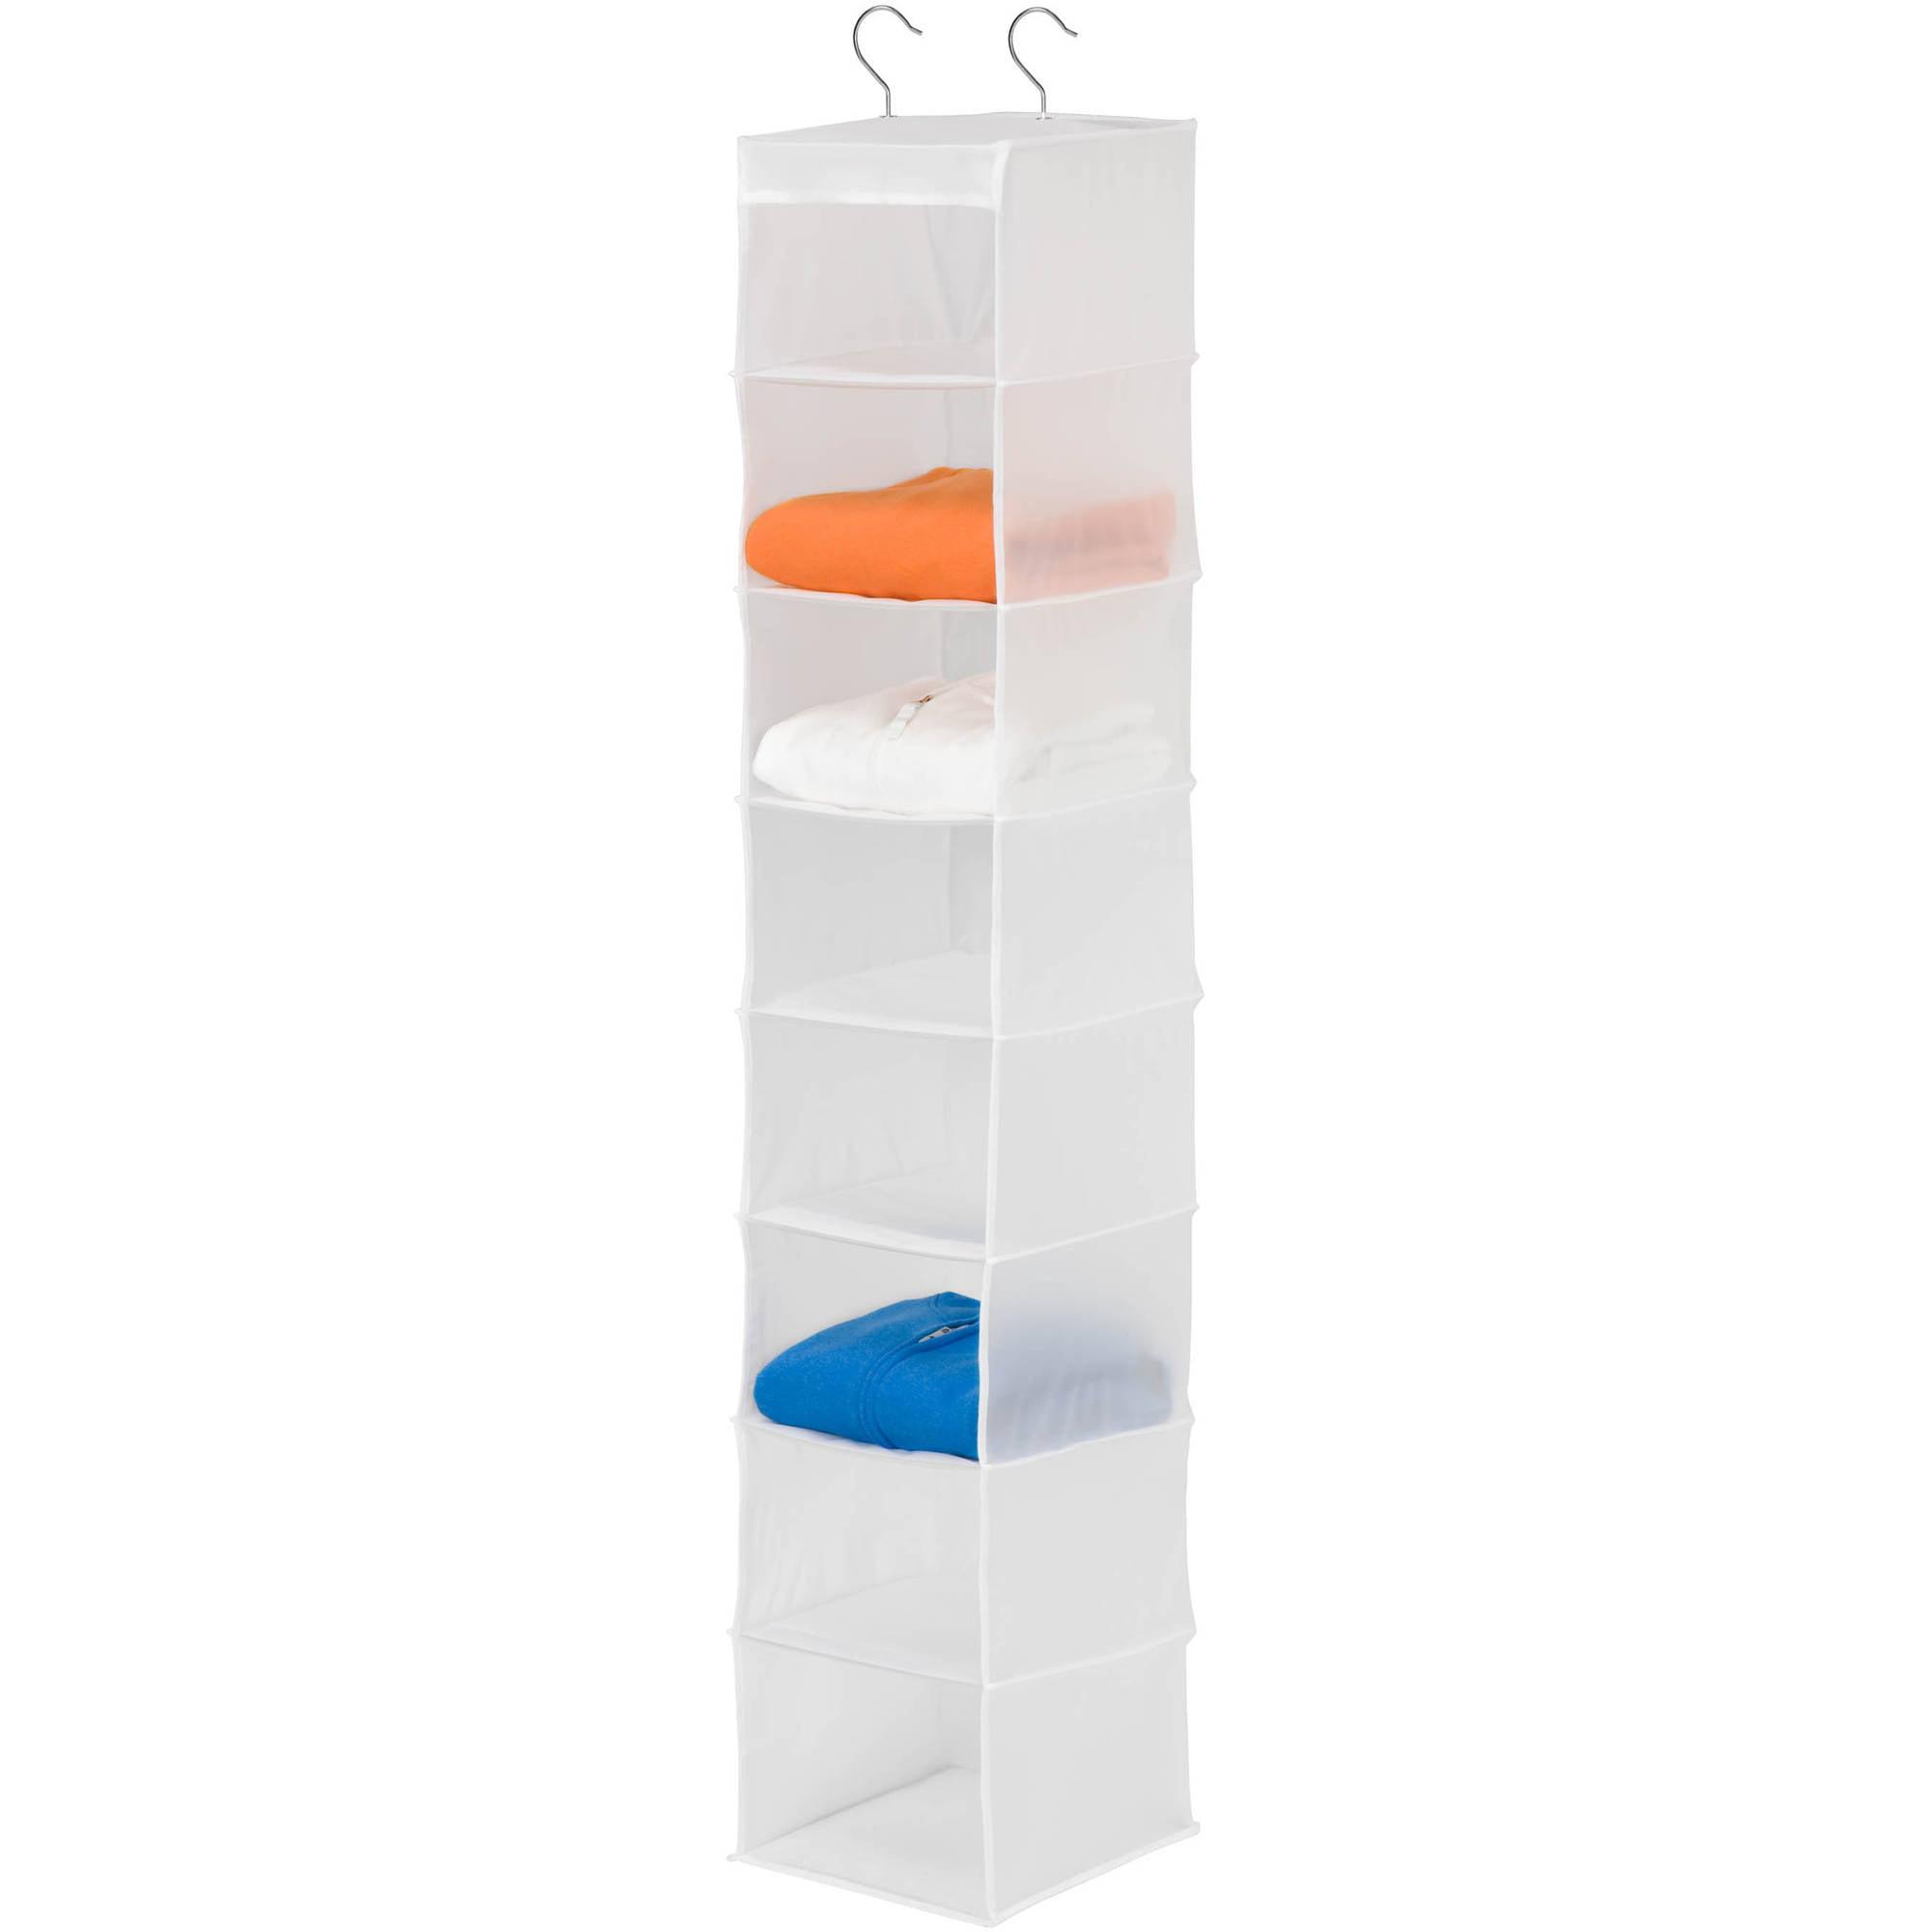 Honey Can Do 8-Shelf PEVA Hanging Organizer, White